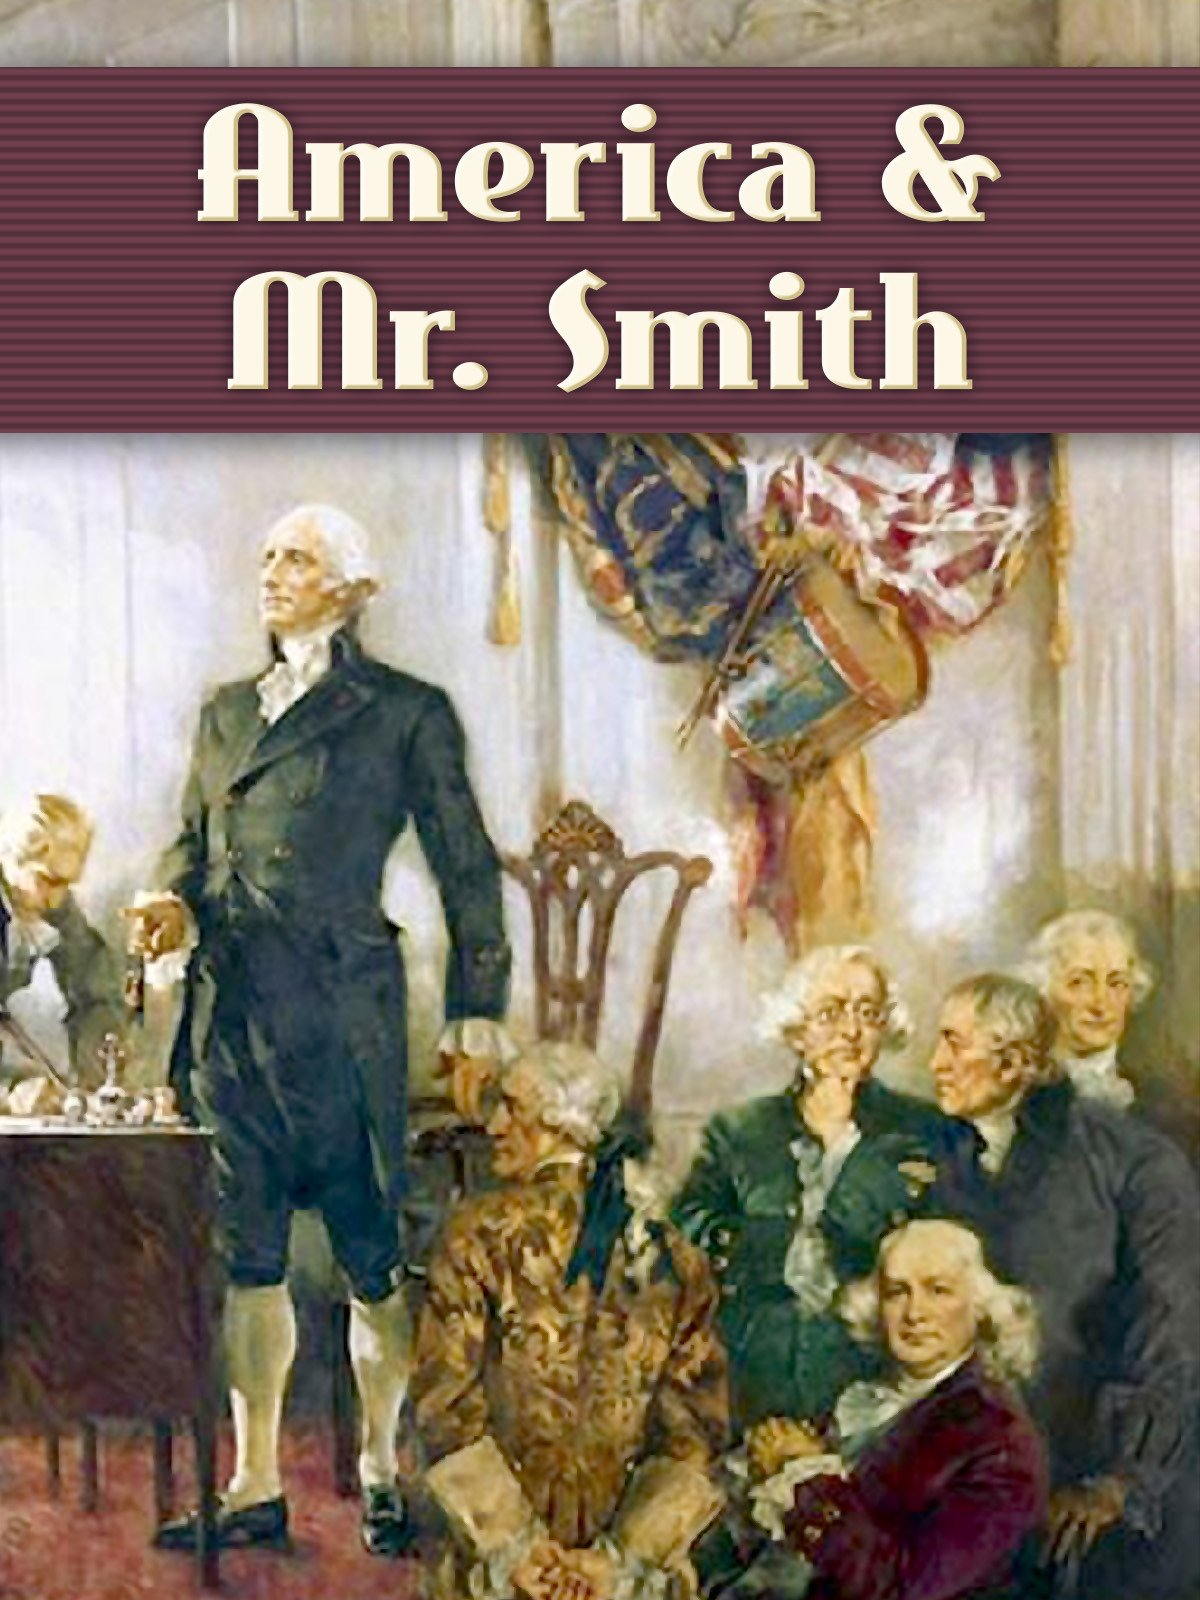 America & Mr. Smith